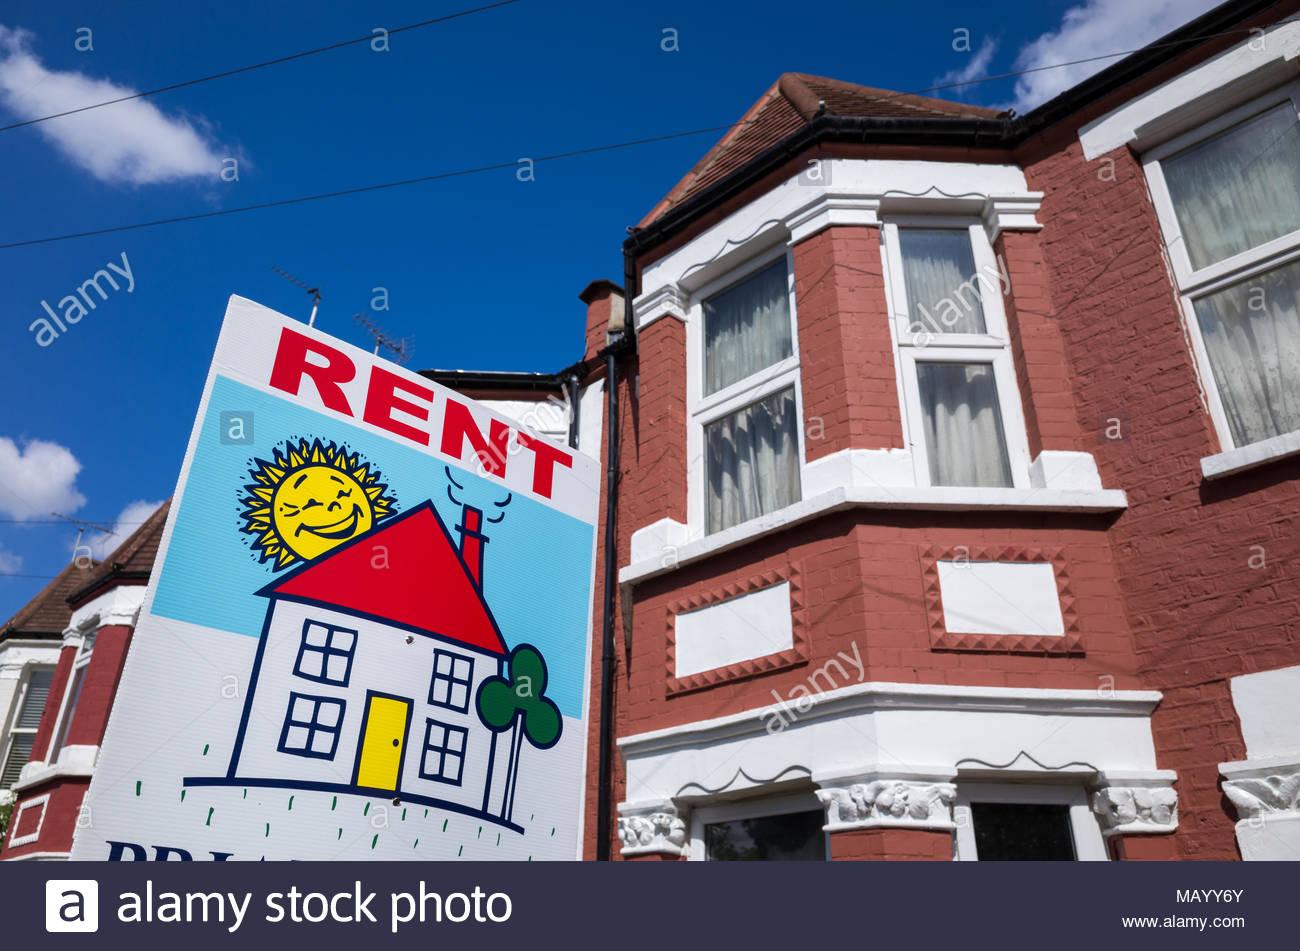 Estate agent rent sign outside terraced house, UK, London - Stock Image